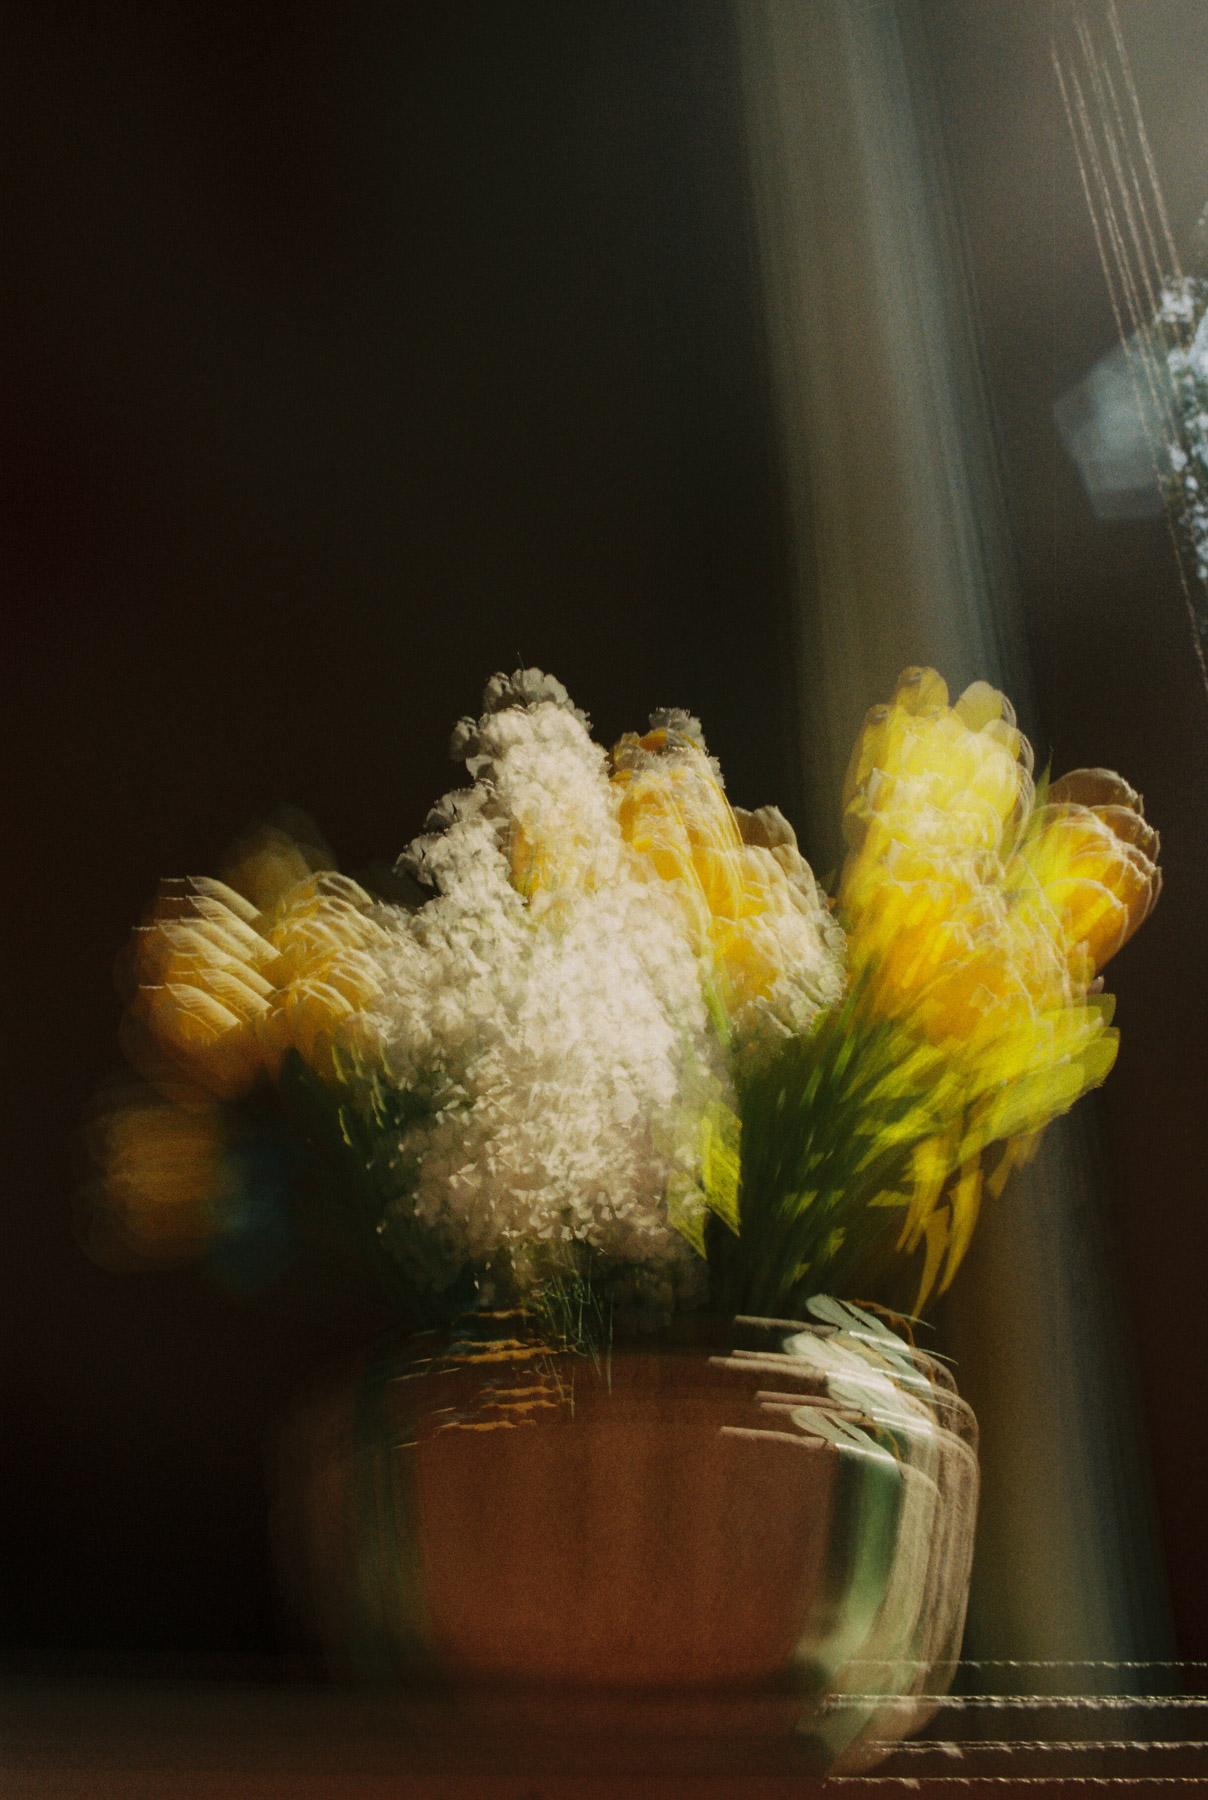 Monet by multiexposure | Canon AE1 Kodak ProImage 100 | Efrain Bojorquez